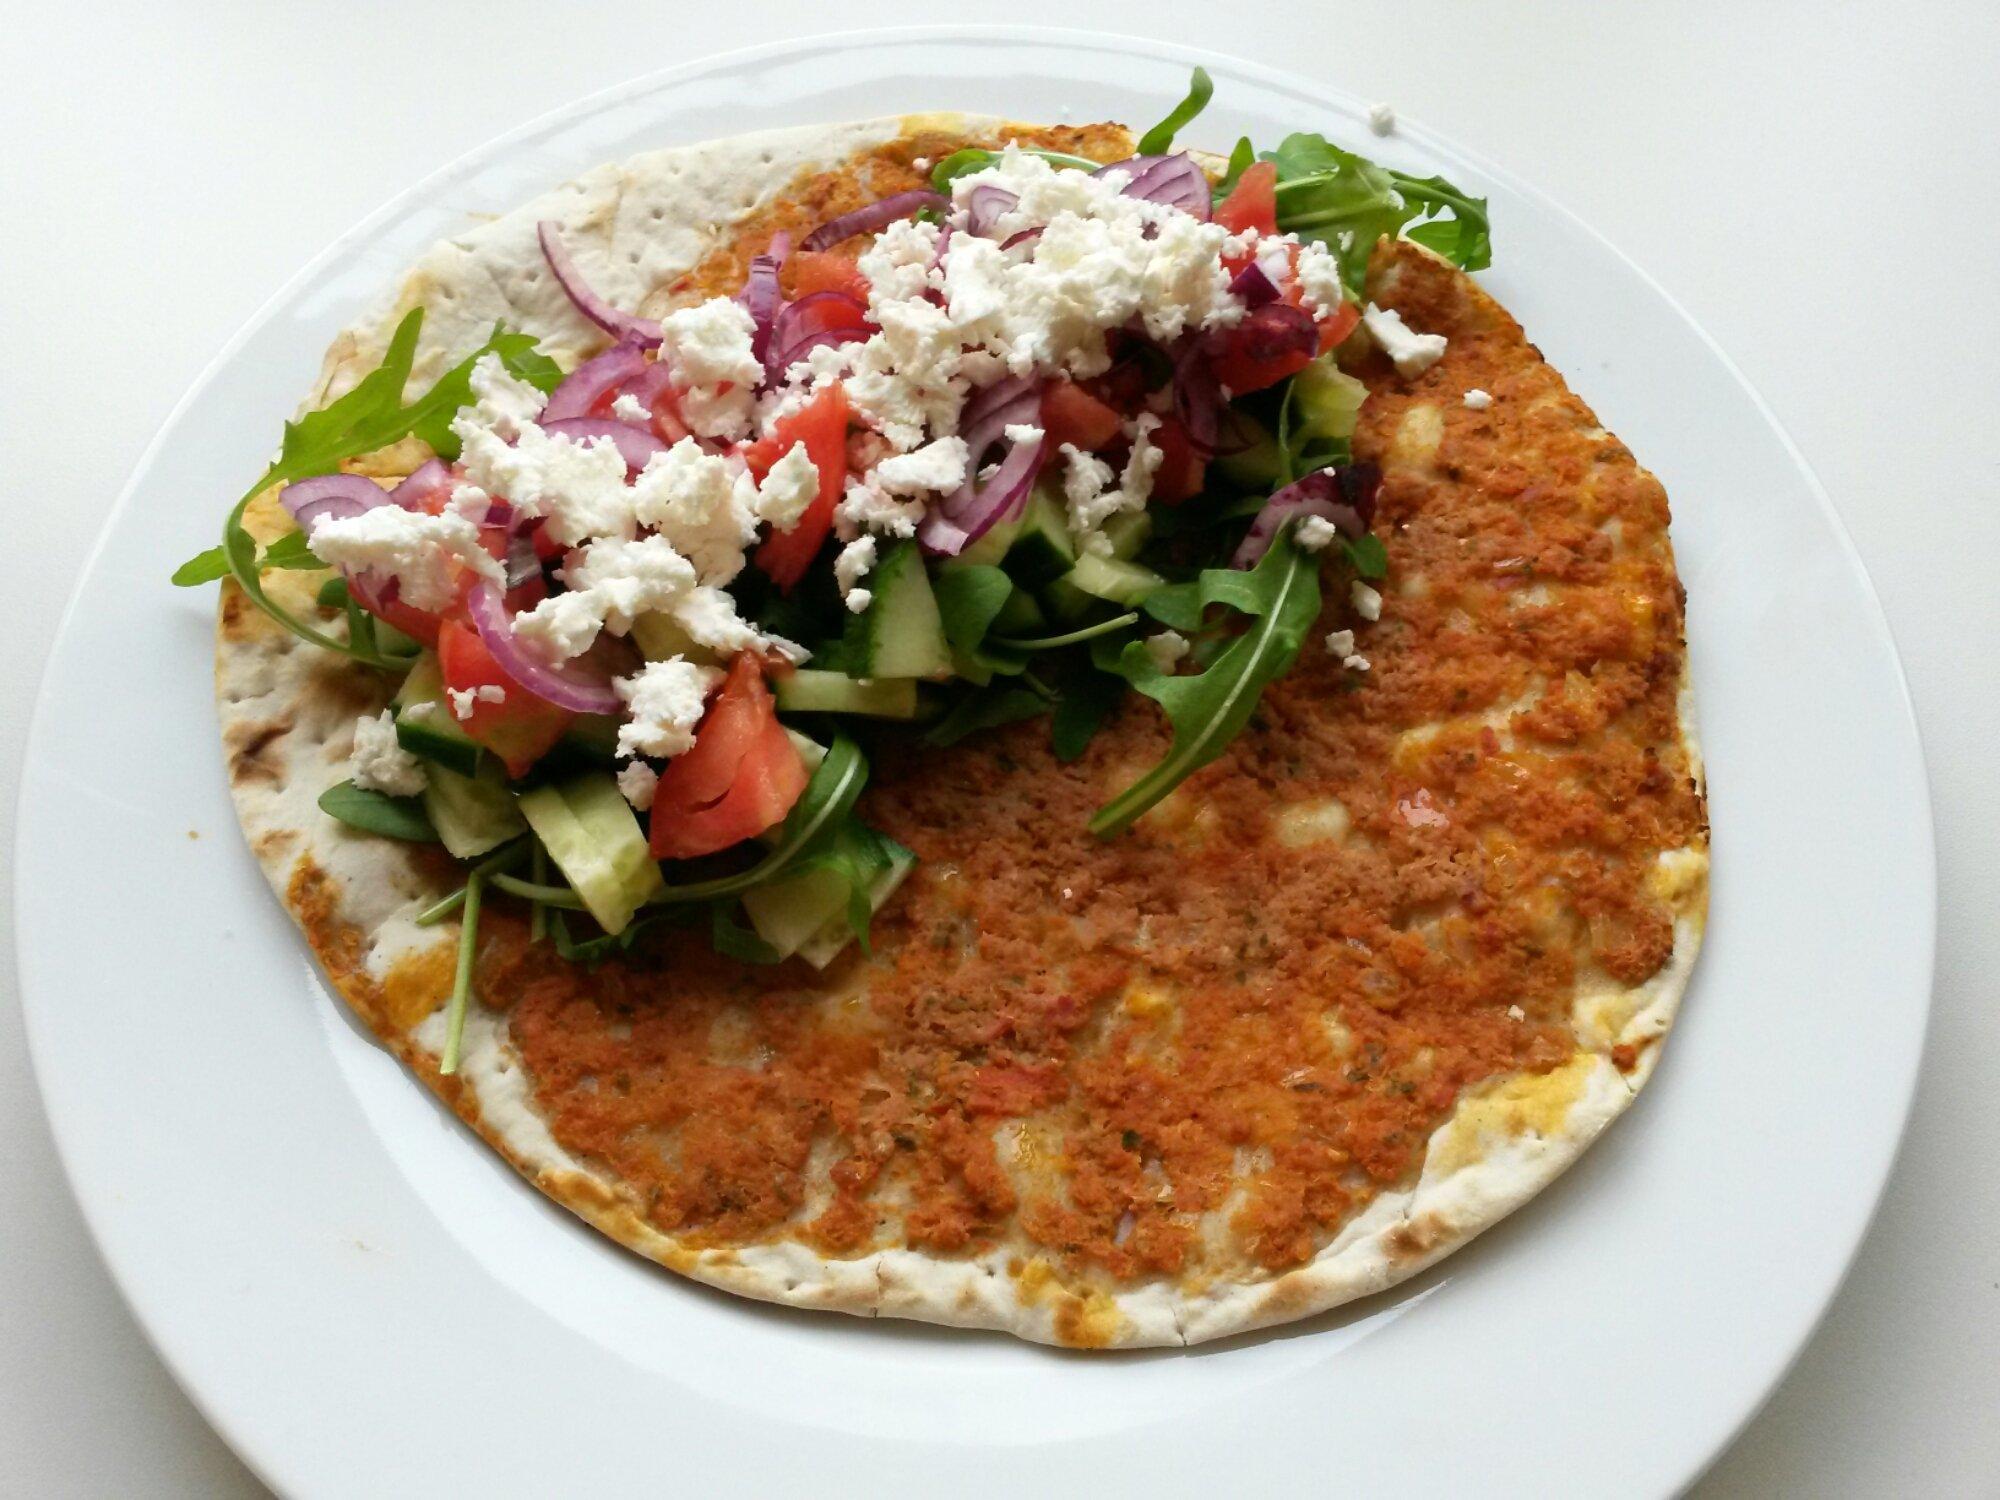 Snelle Turkse pizza met salade